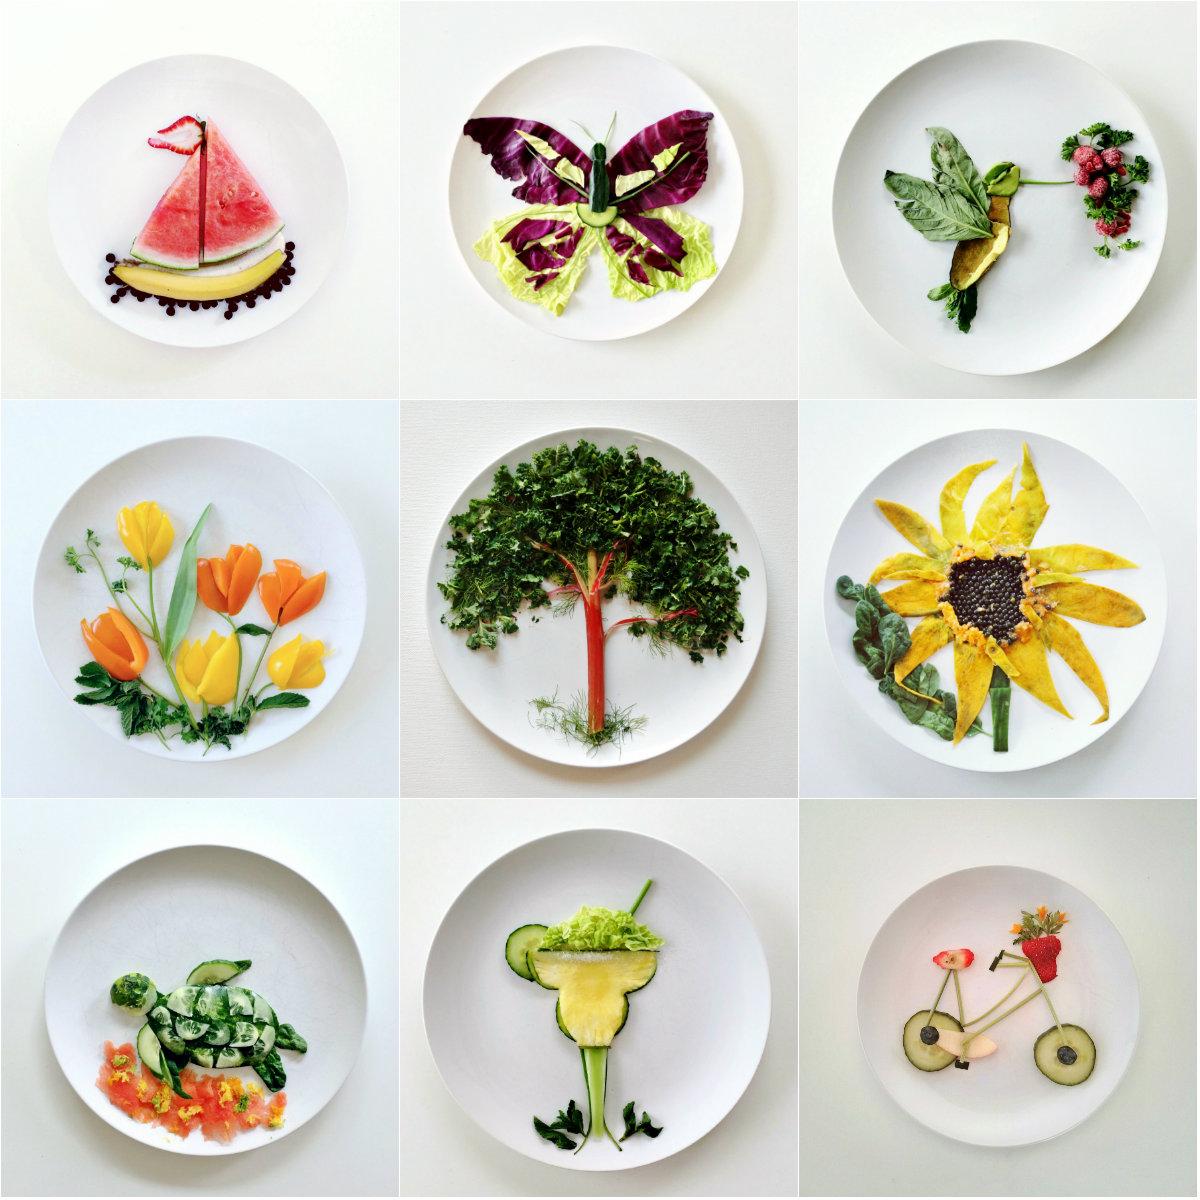 Tumblr Artist Turns Food Into Amazing Art